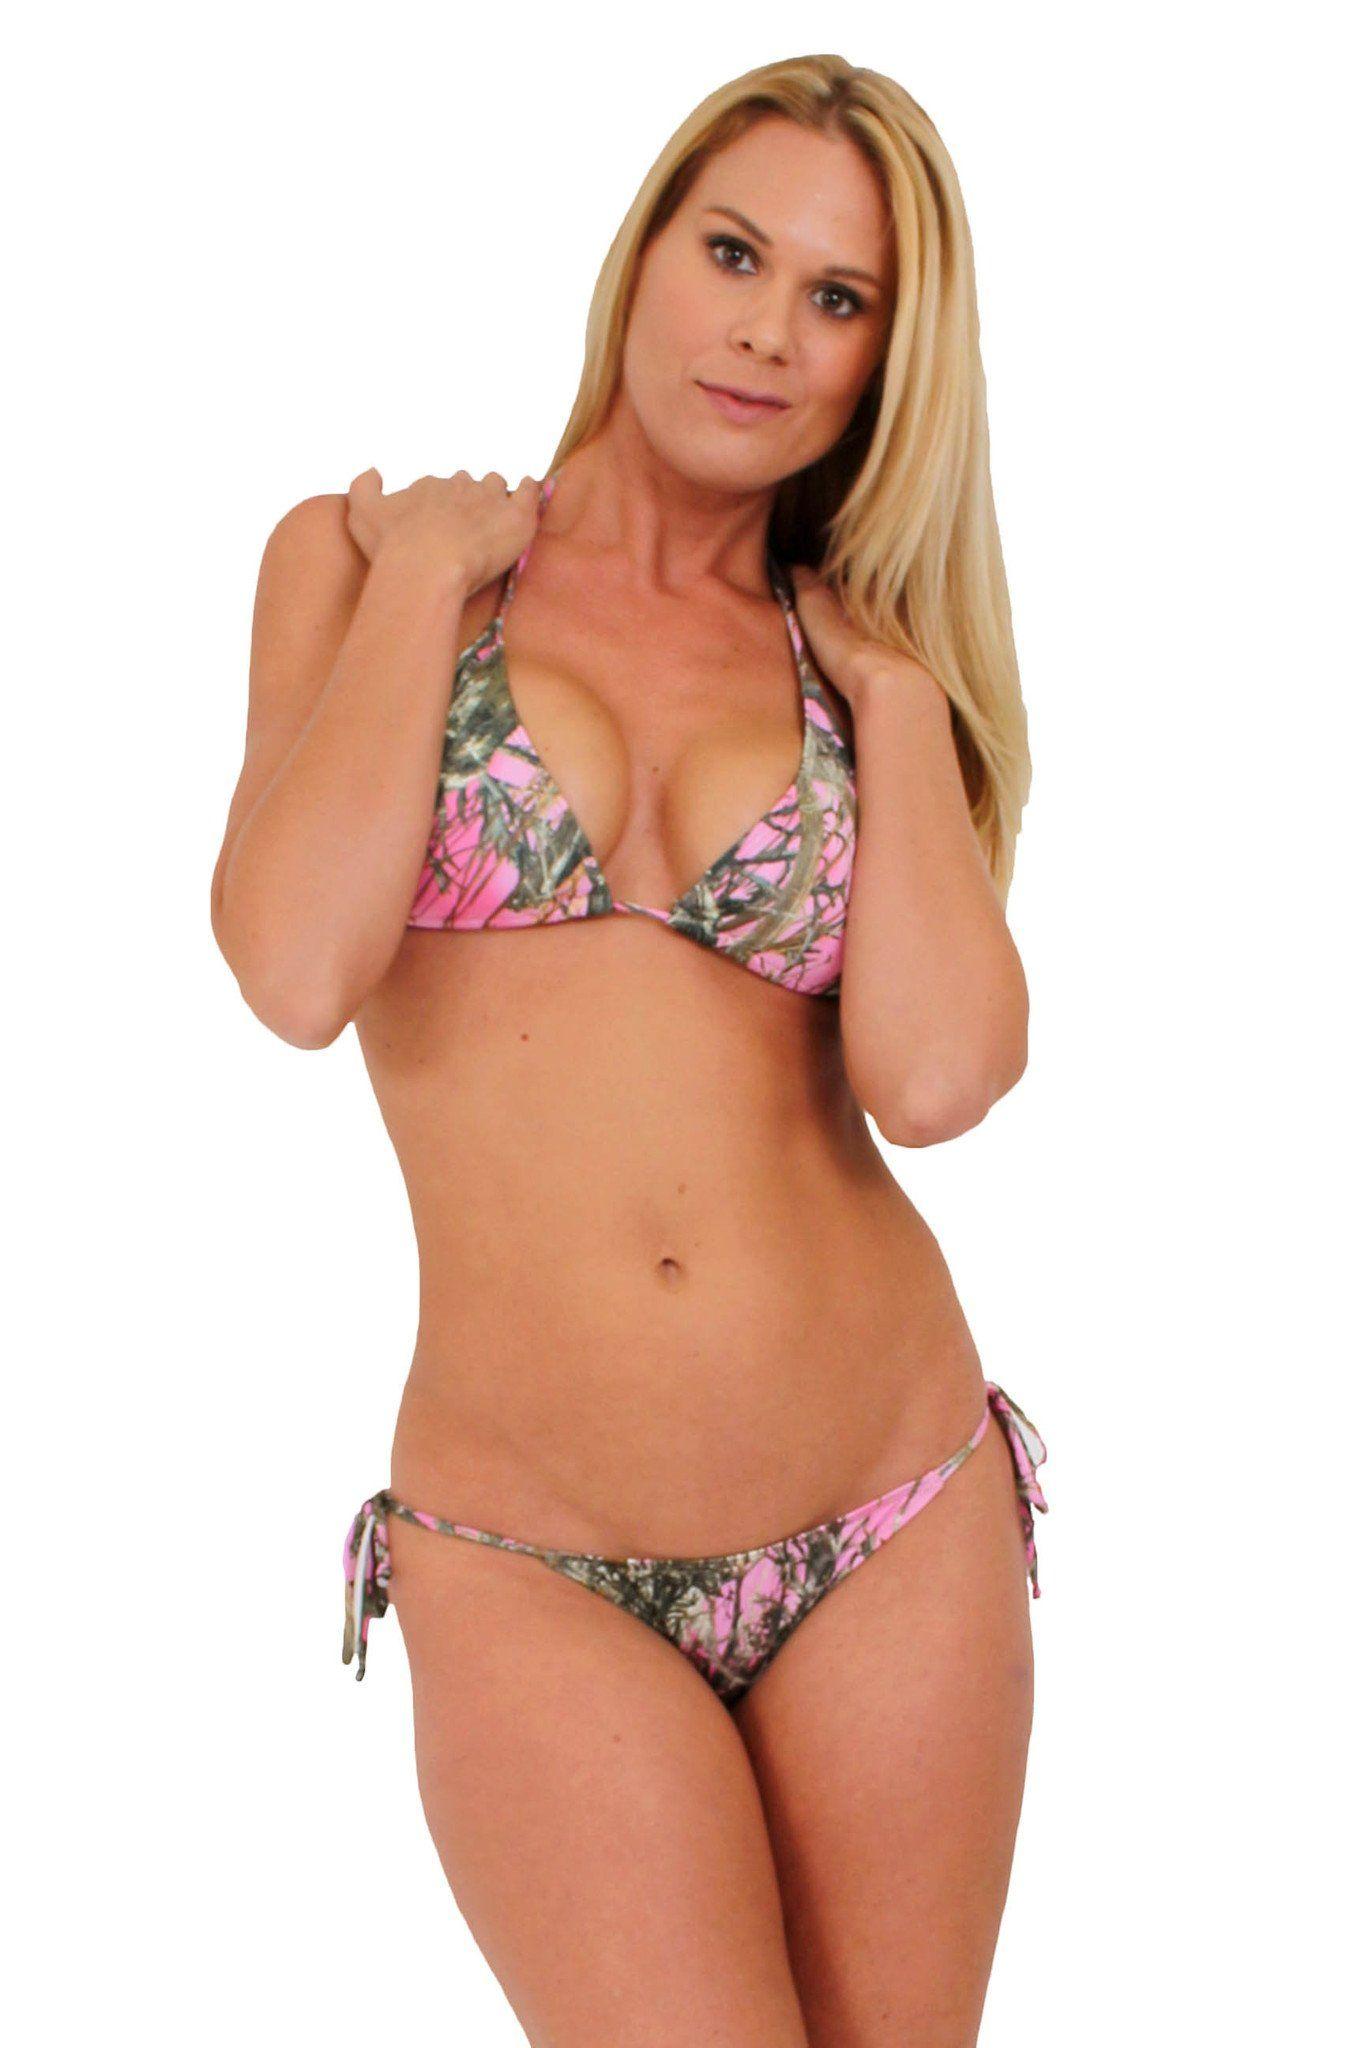 e271059e38ac Women's Camo Bikini True Timber Swimwear: PINK Made in the USA - SHORETRENDZ